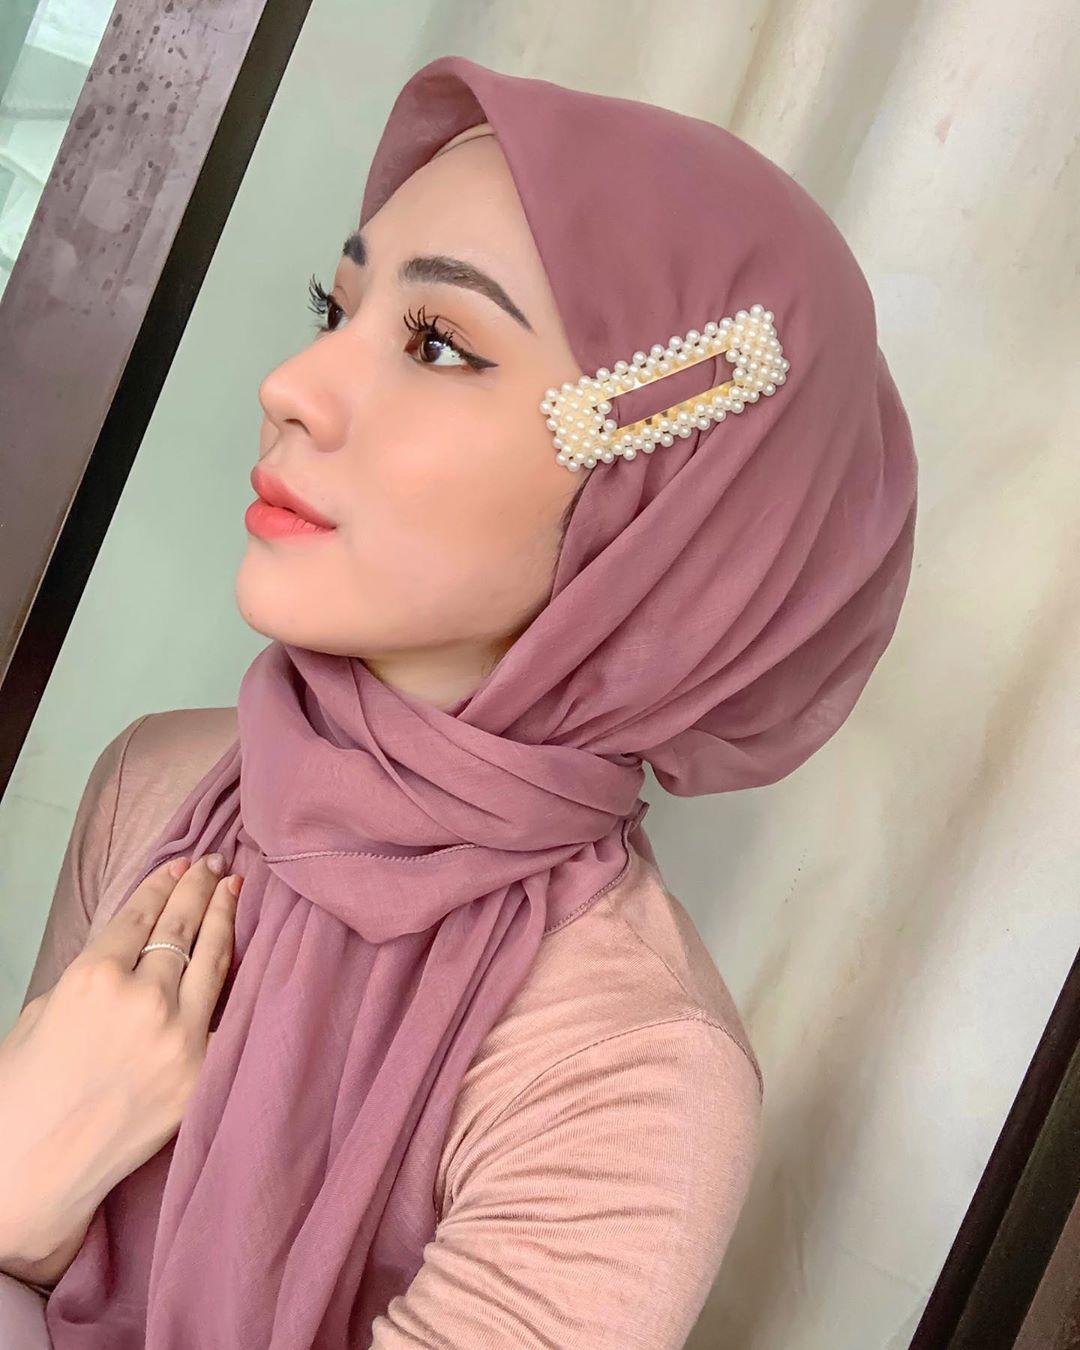 Trend Hijab Kekinian Gaya Jepit Jennie Alias Pashmina Jepit Pakai Yuk Sheblinks Blog Remaja Cewek